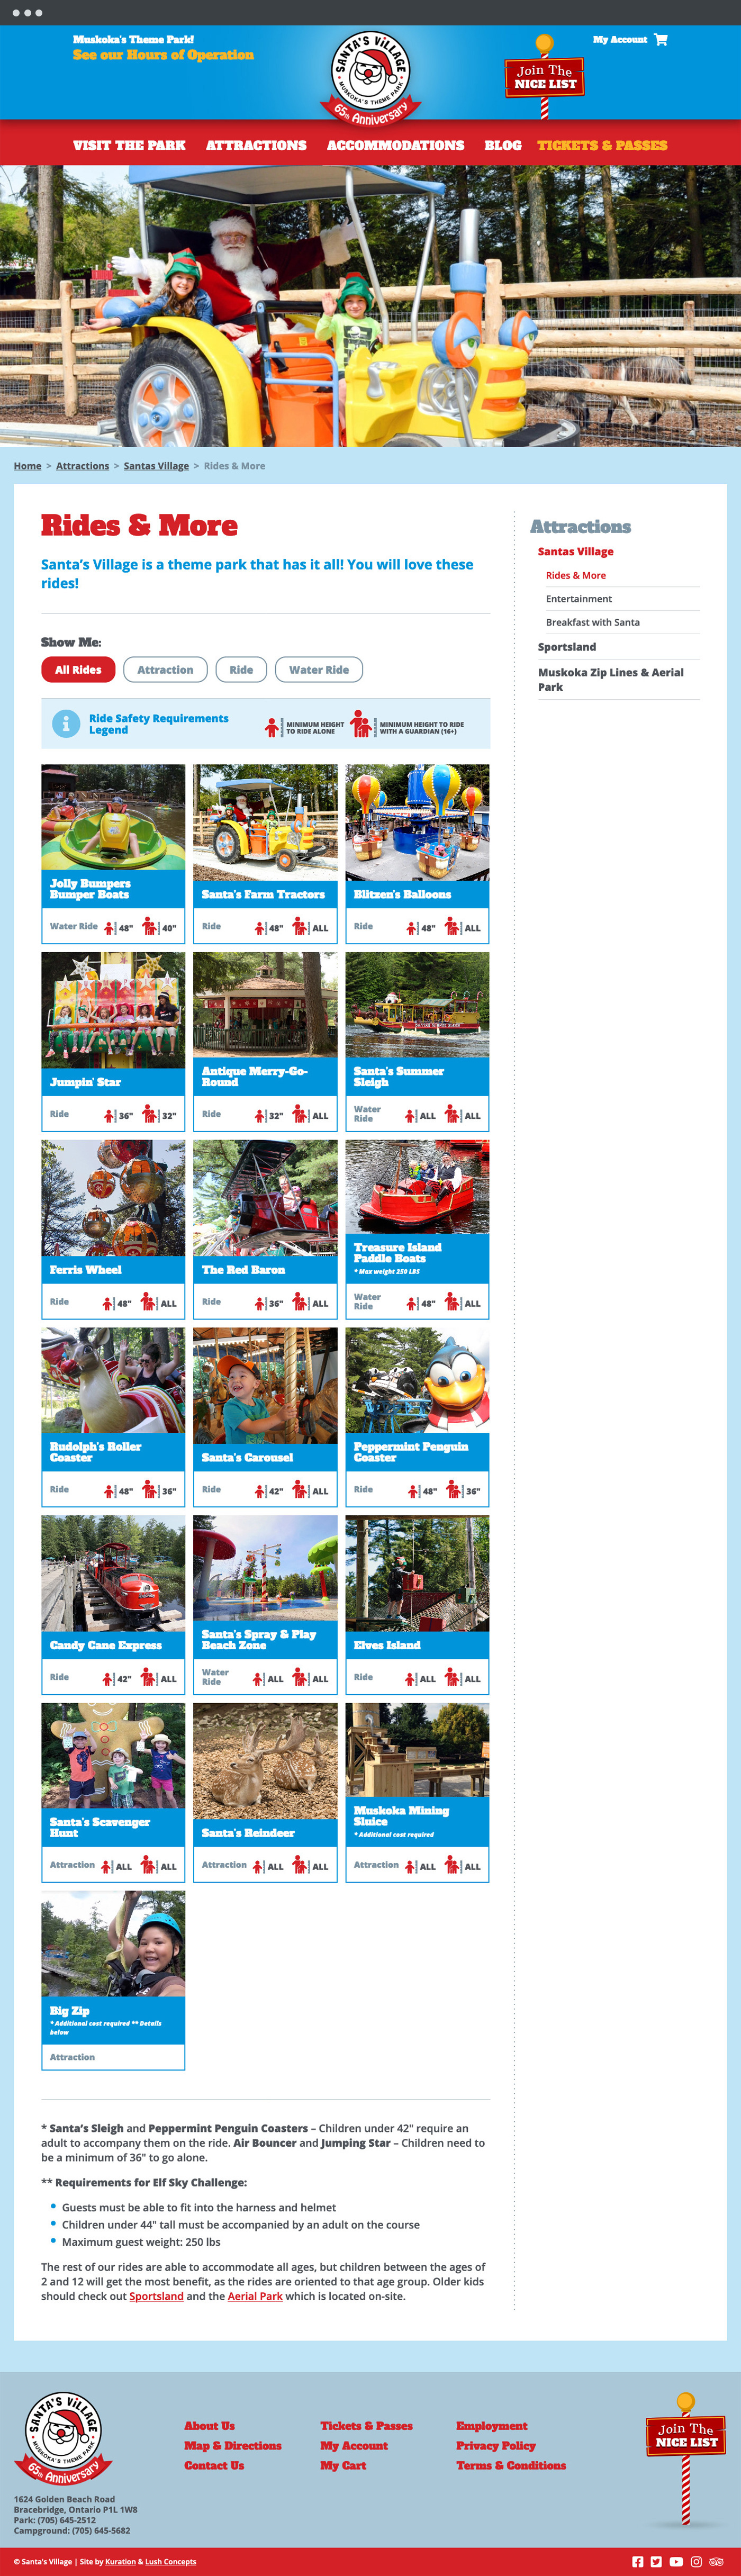 Santa's Village Rides page design